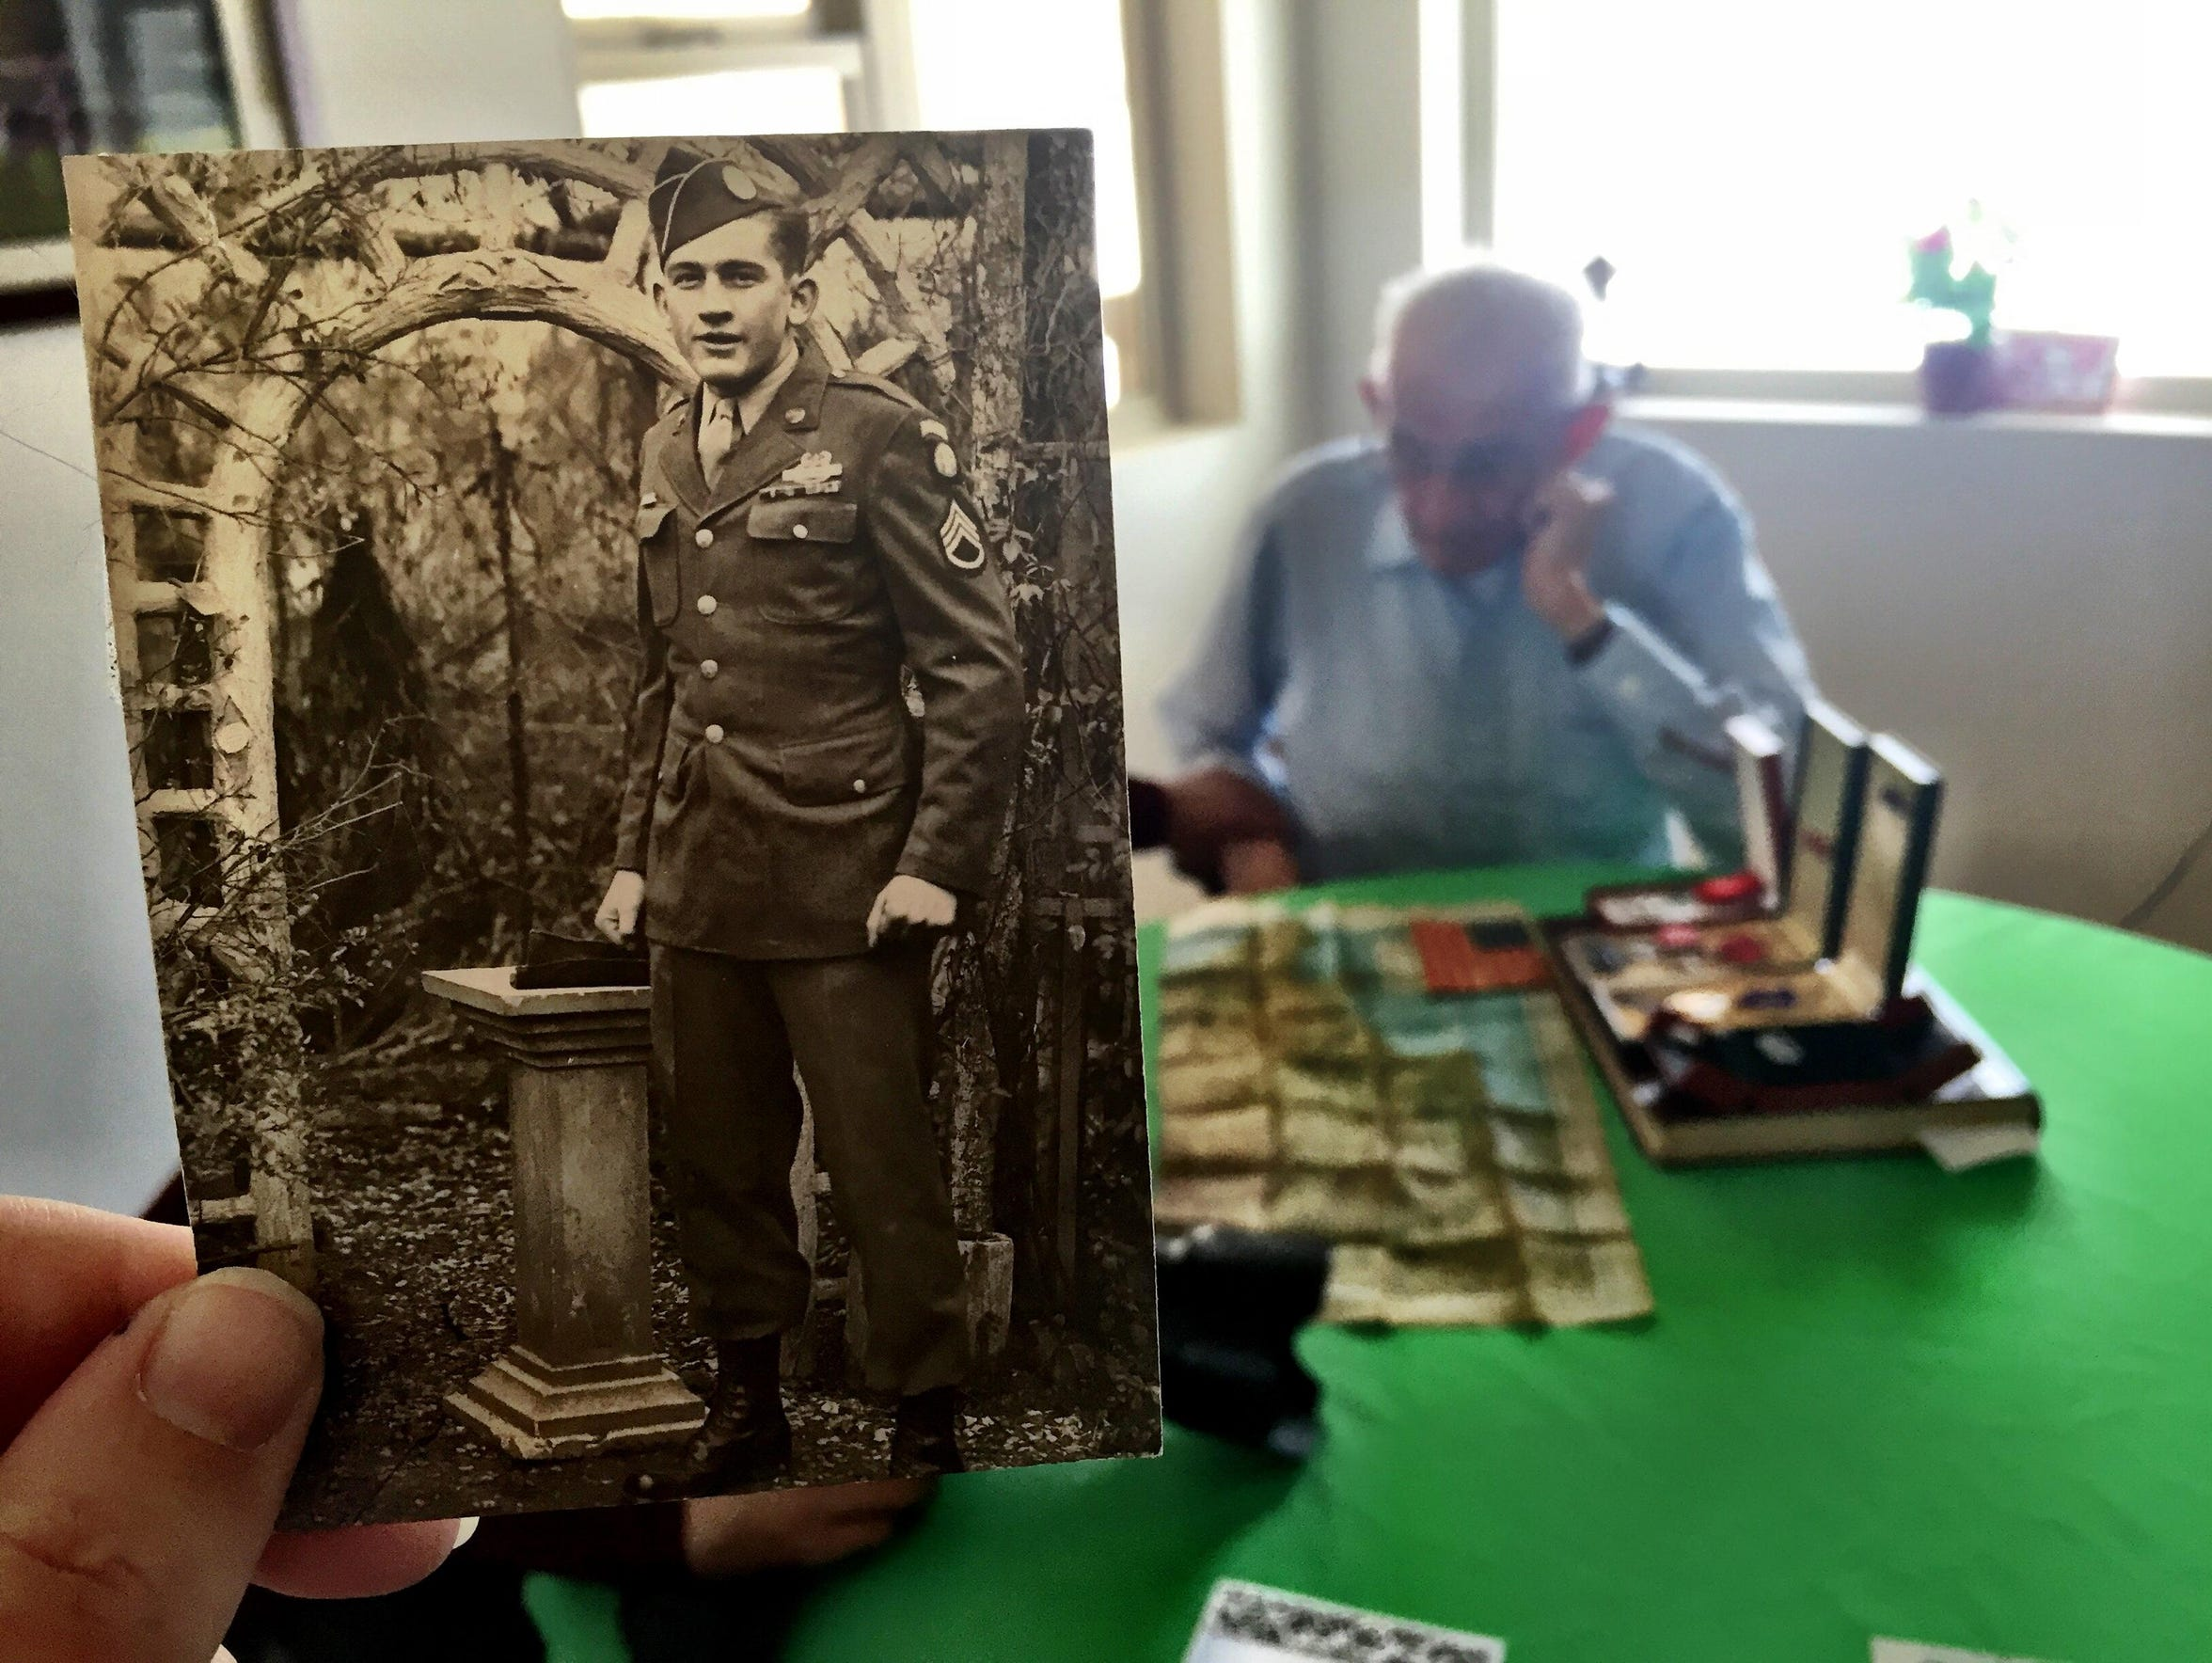 Bud Olson looks through photos and mementos from World